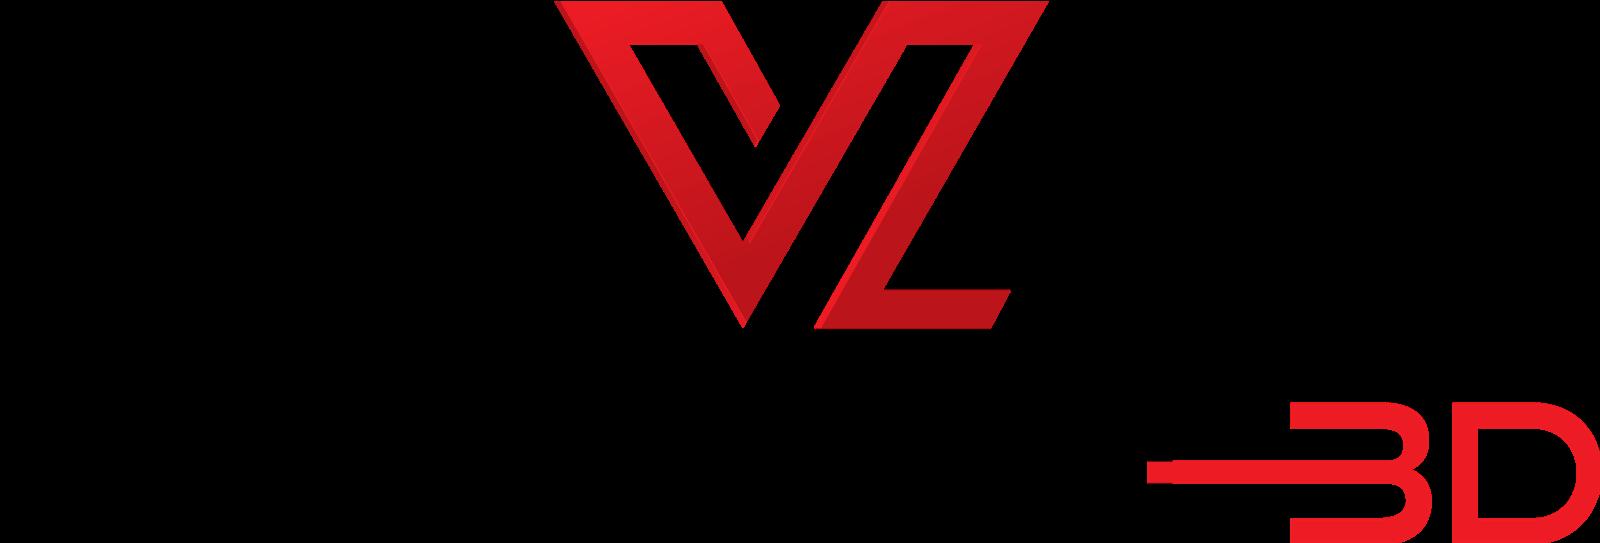 VisualLive 3D Logo.png